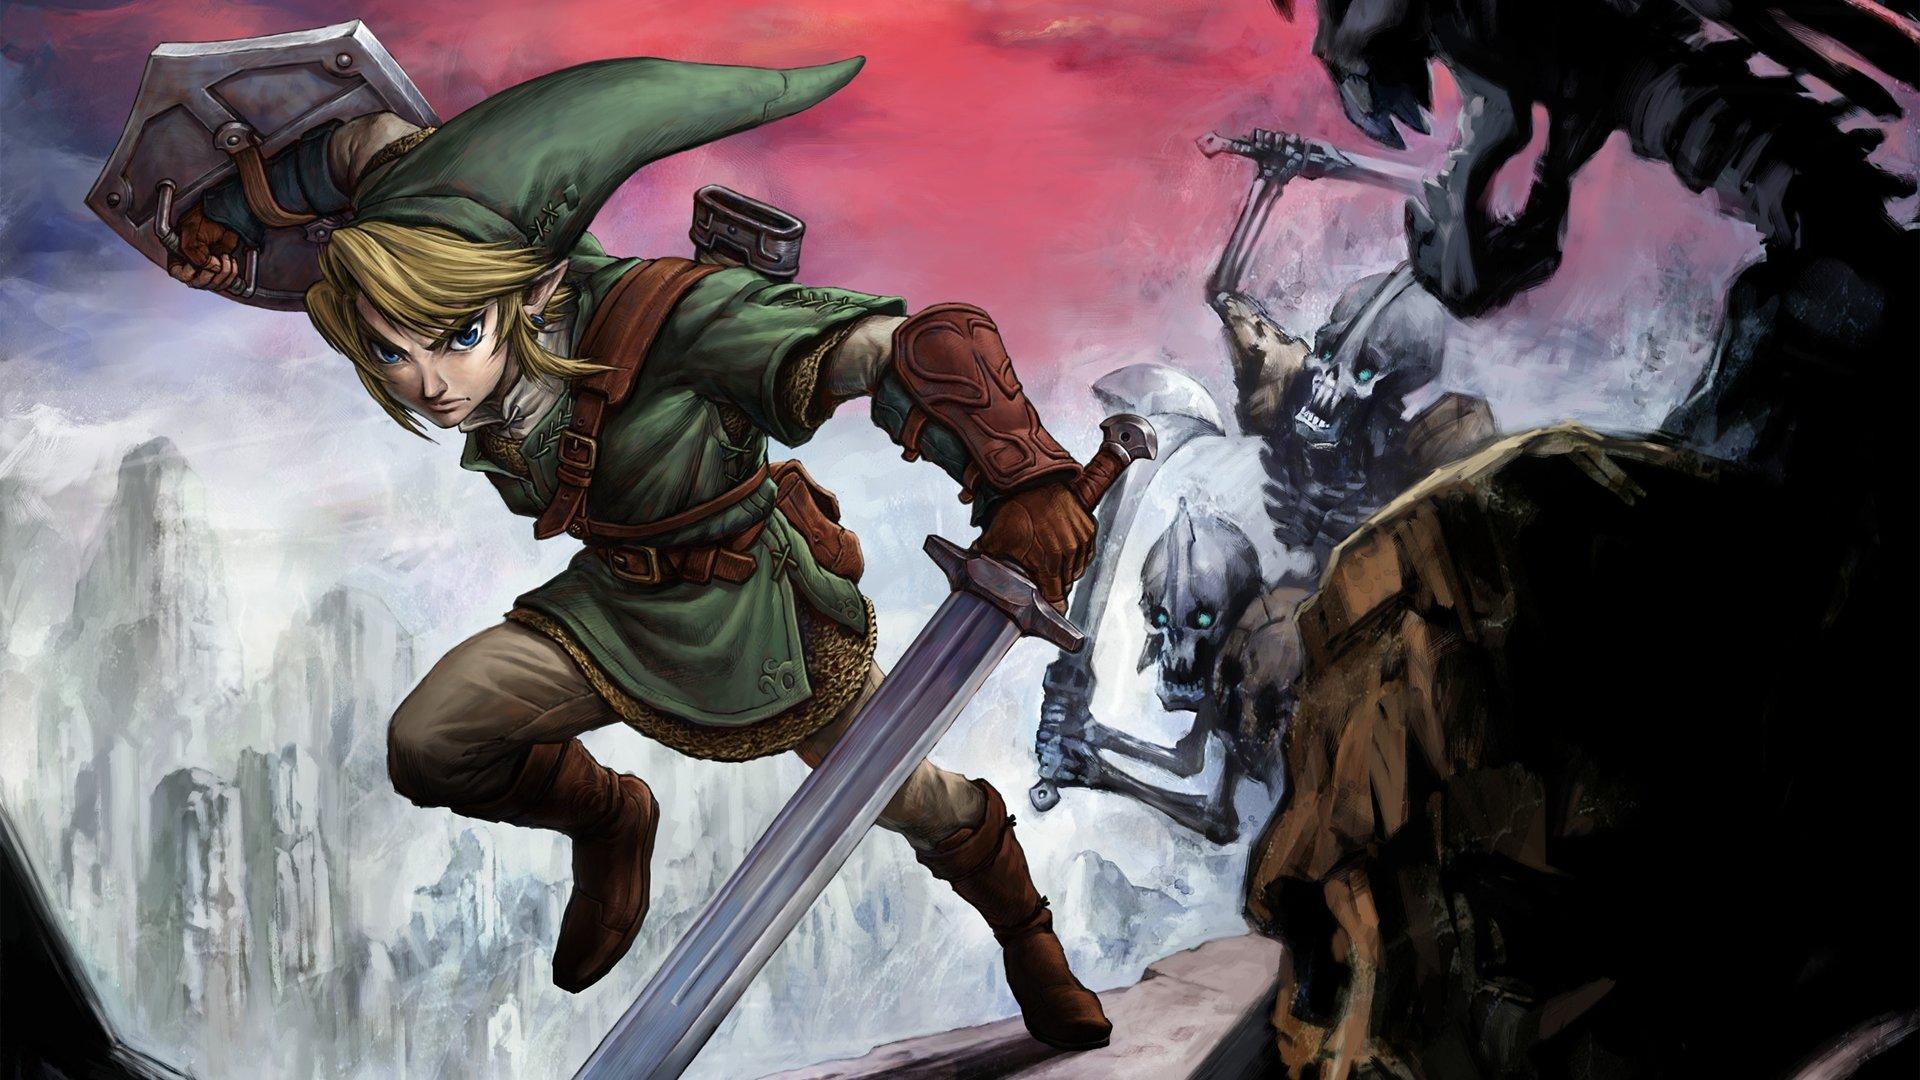 The Legend Of Zelda Twilight Princess Wallpapers 1920x1080 Full Hd